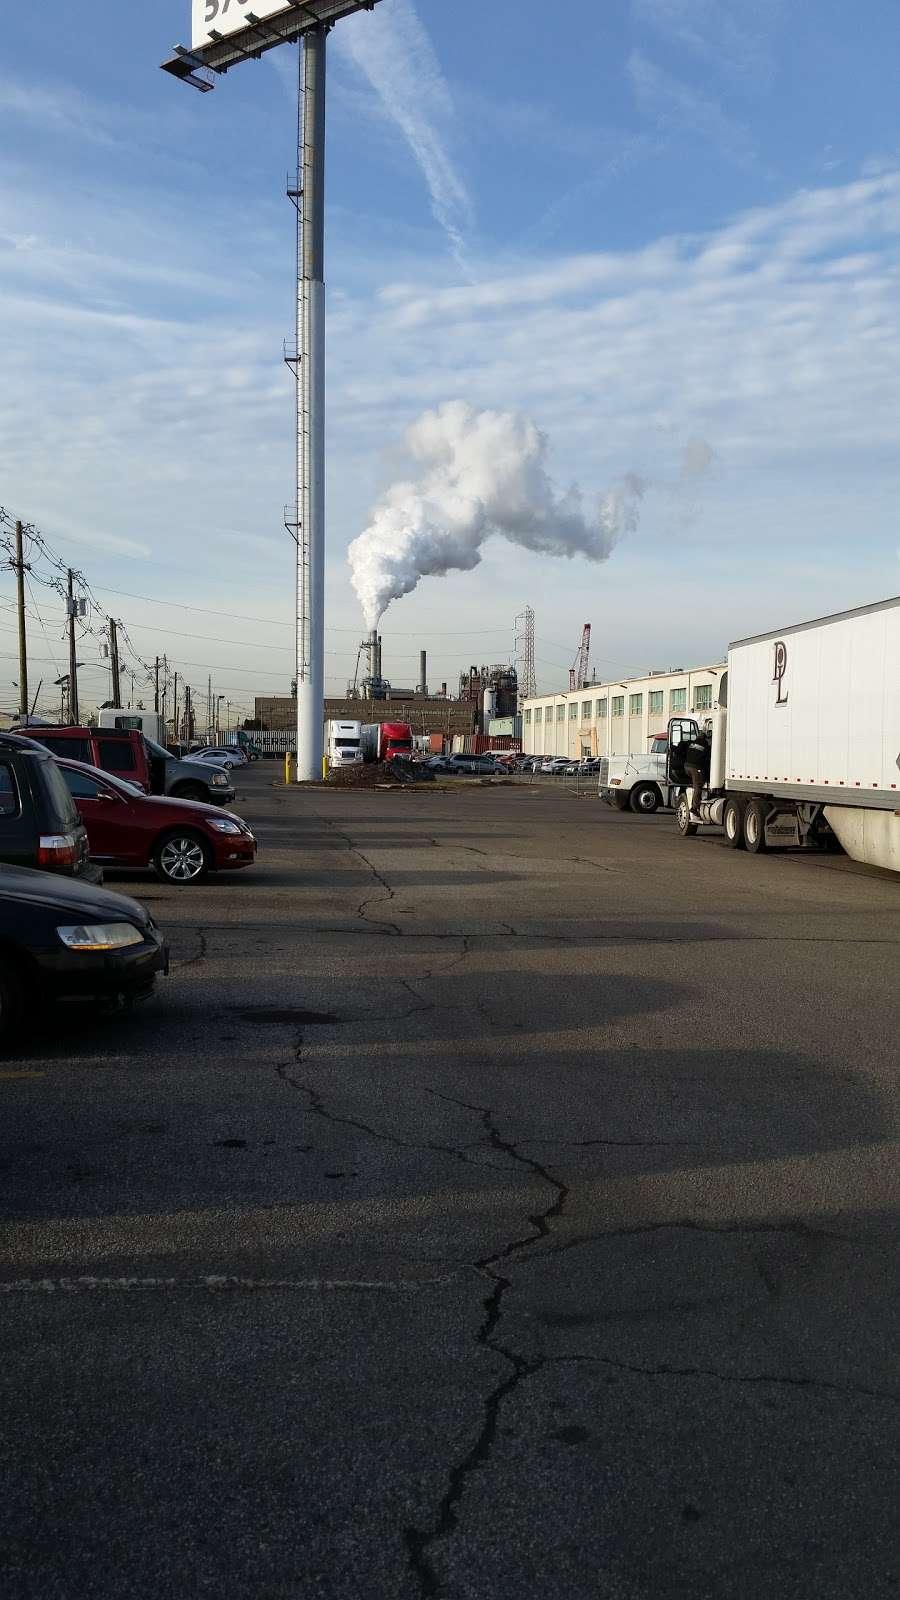 Rocket II District Inc - storage    Photo 1 of 1   Address: 2521 Brunswick Ave, Linden, NJ 07036, USA   Phone: (908) 862-6611